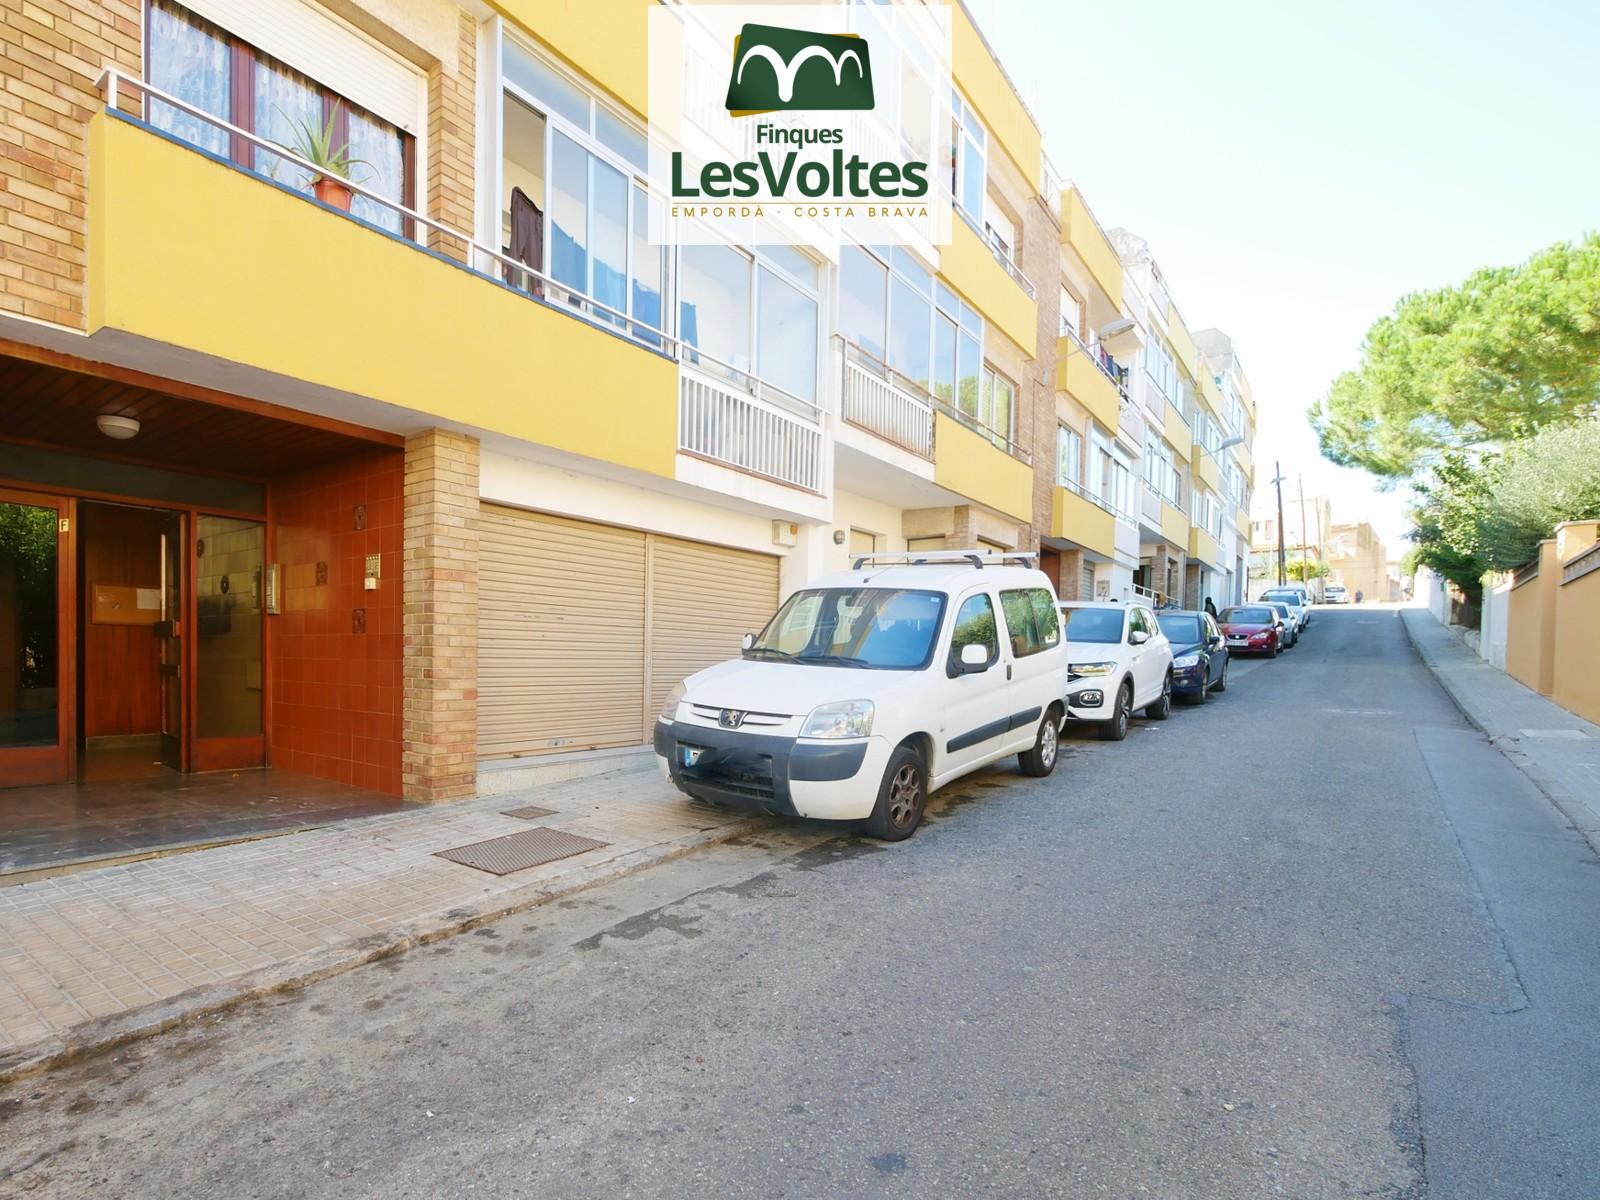 Local comercial en planta Baixa en venda situat en zona residencial de Palafrugell.